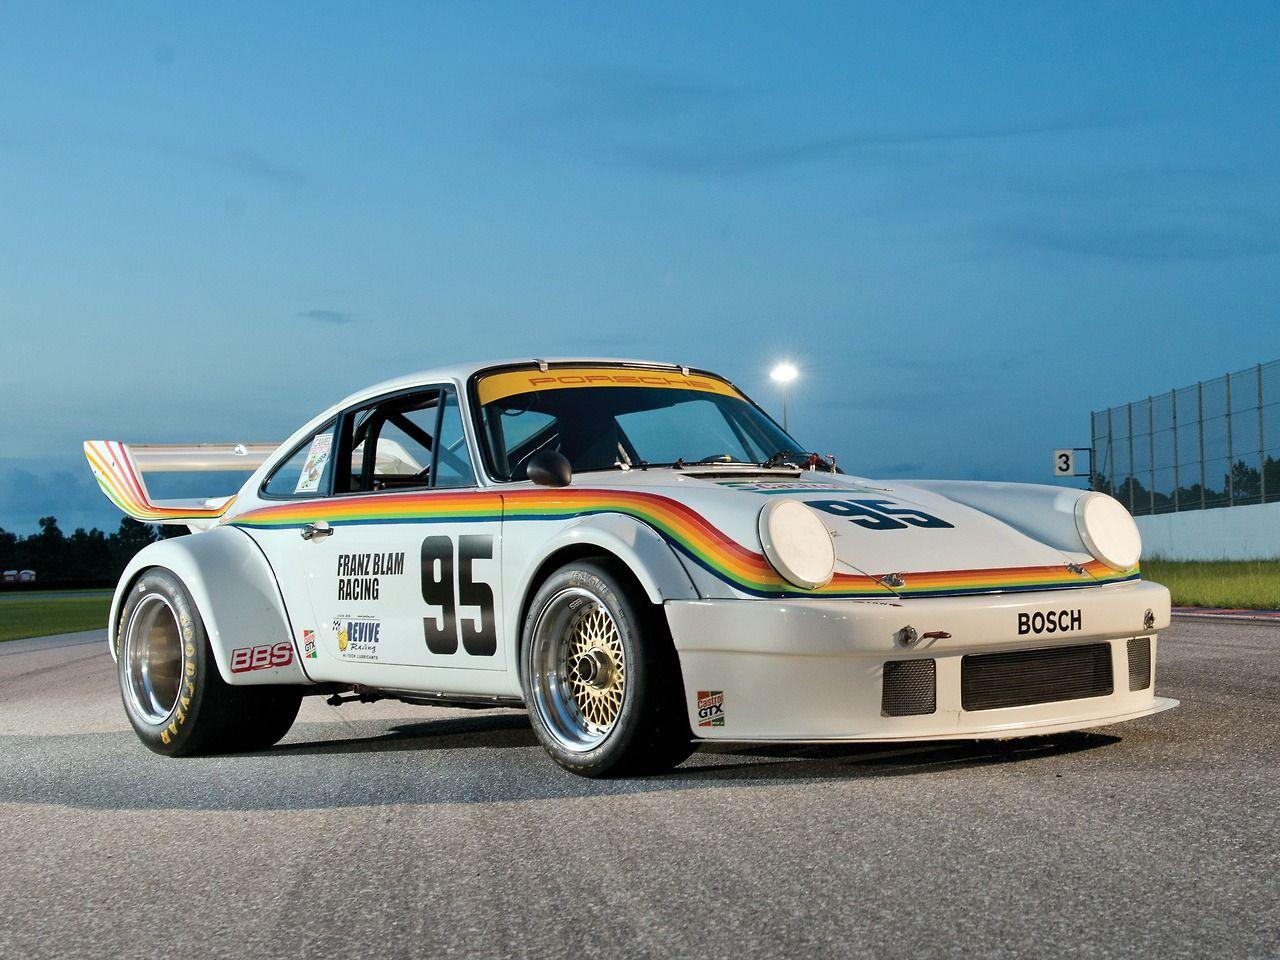 Porsche 934 Turbo Rsr 1977 Porsche Rsr Porsche 911 Rsr Porsche 911